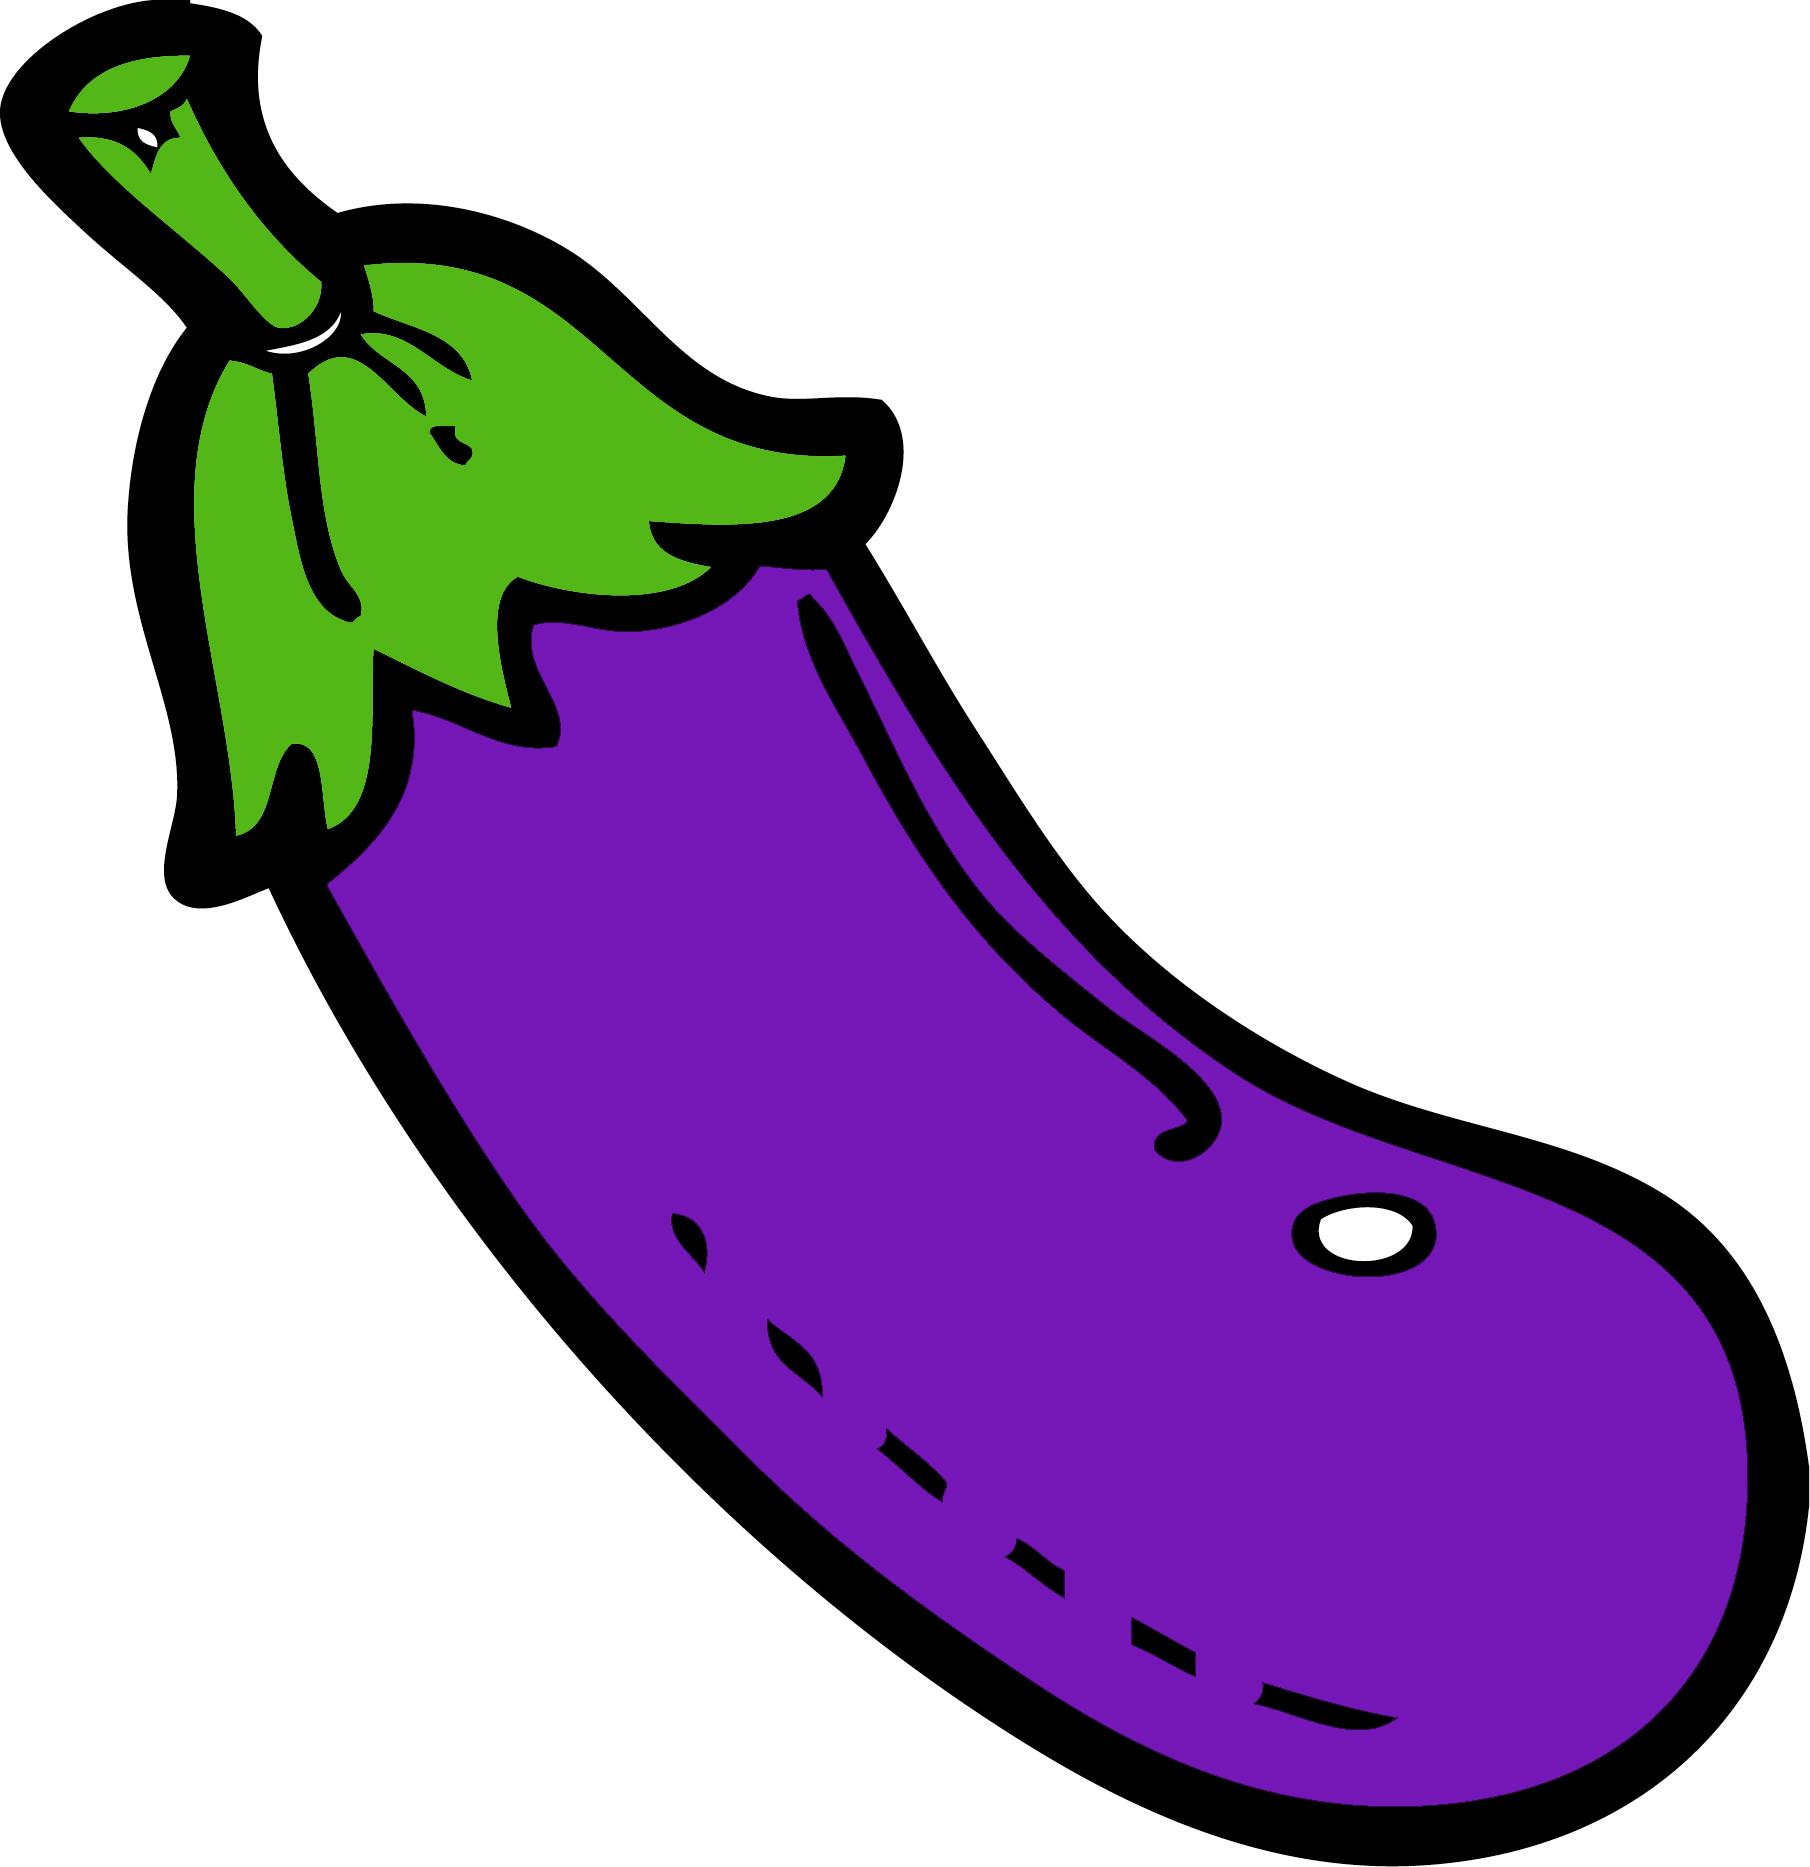 1810x1867 Funny Eggplant Clipart